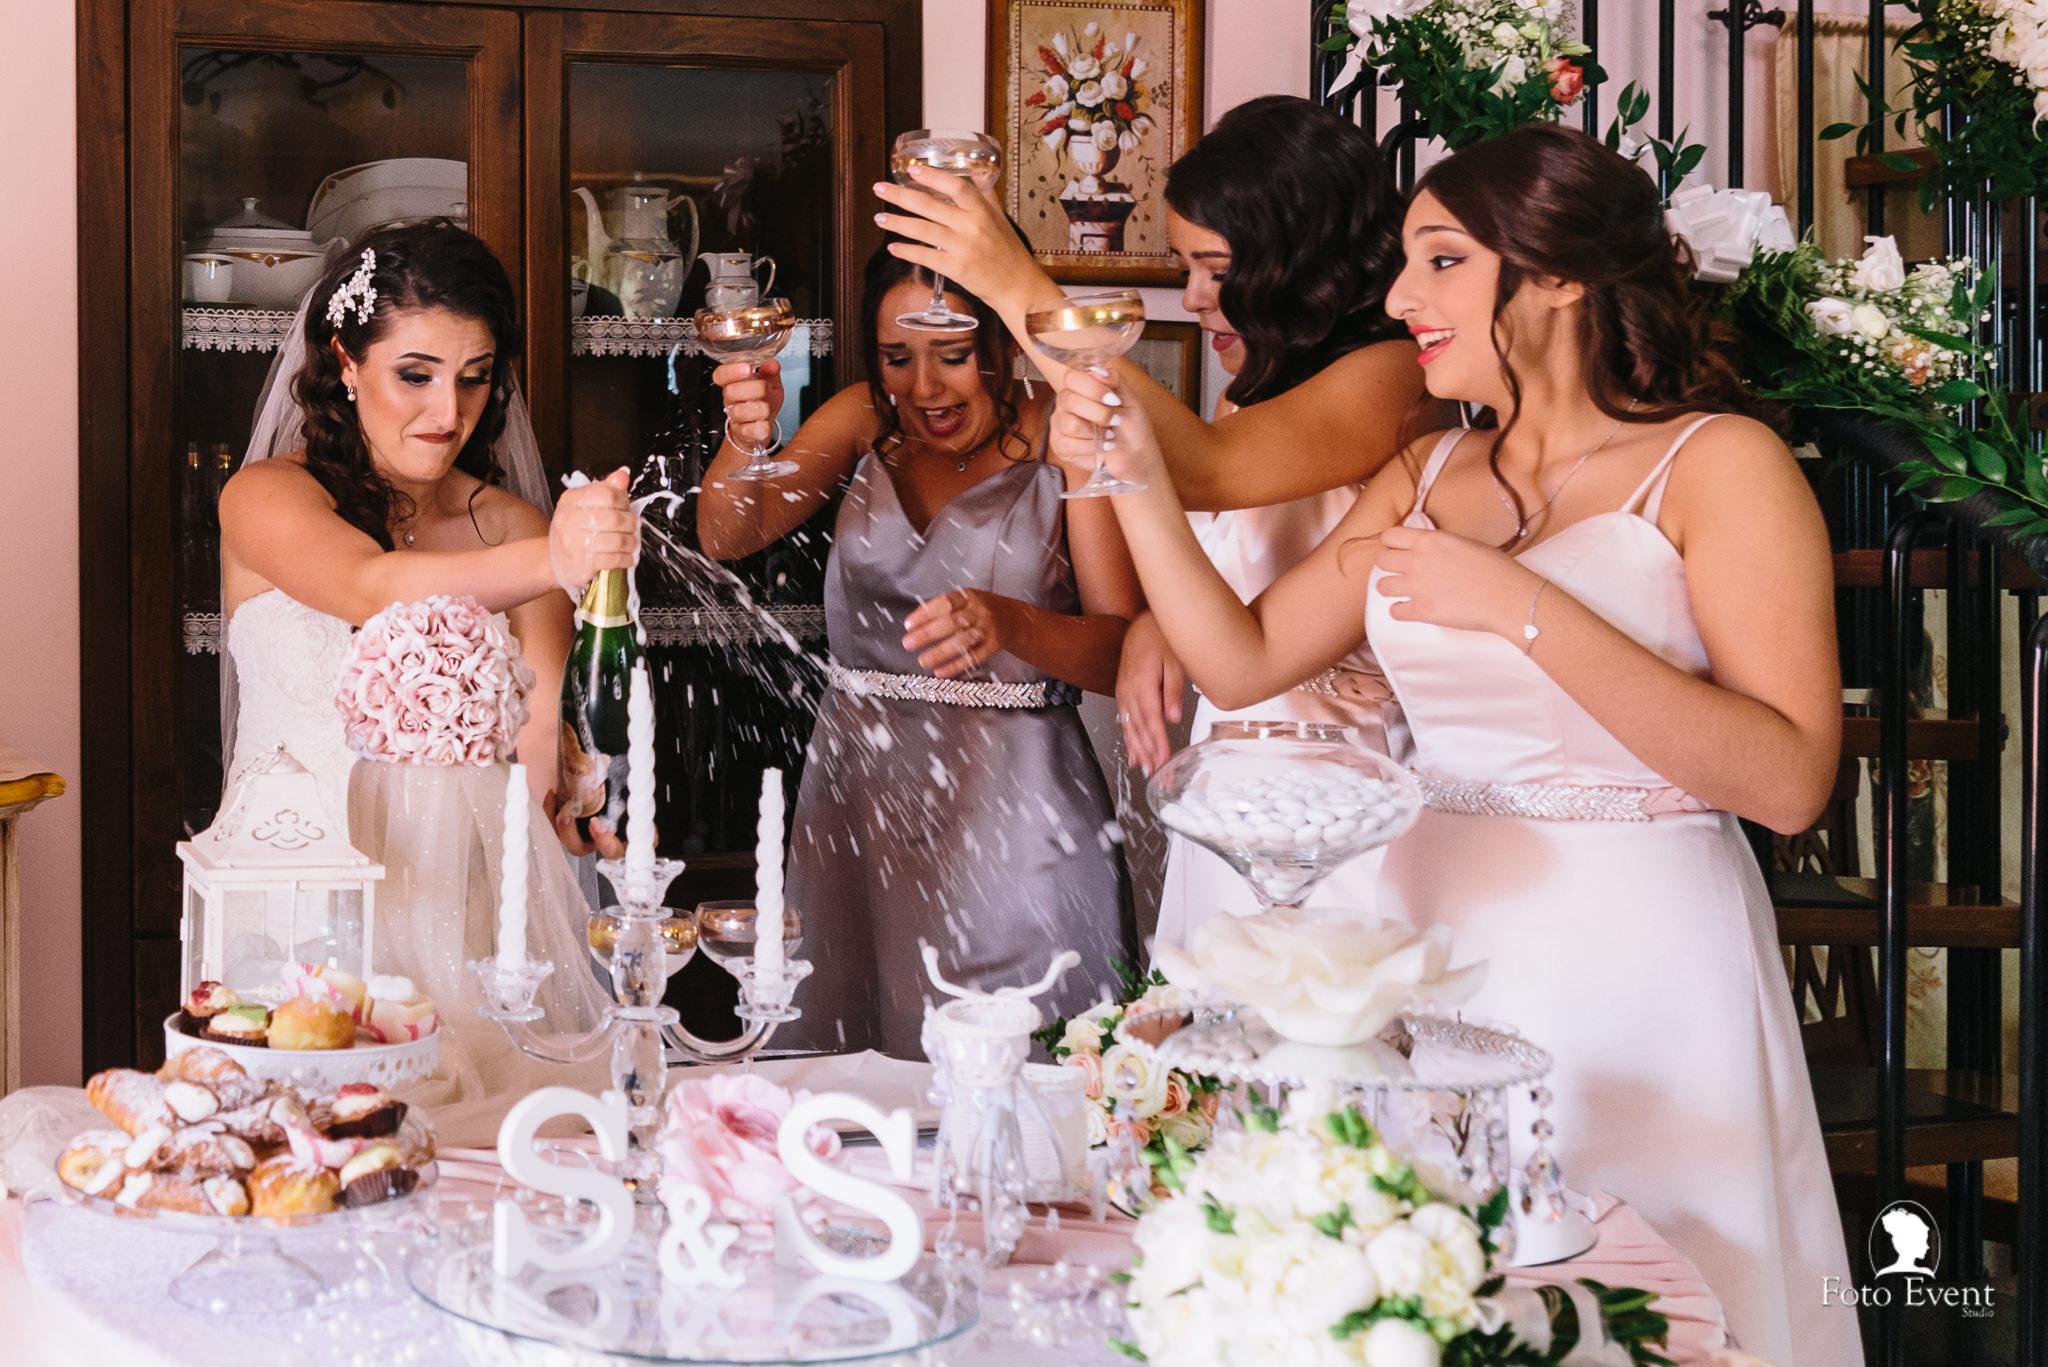 027-2019-08-31-Matrimonio-Serena-e-Saverio-Tarantino-5DE-921